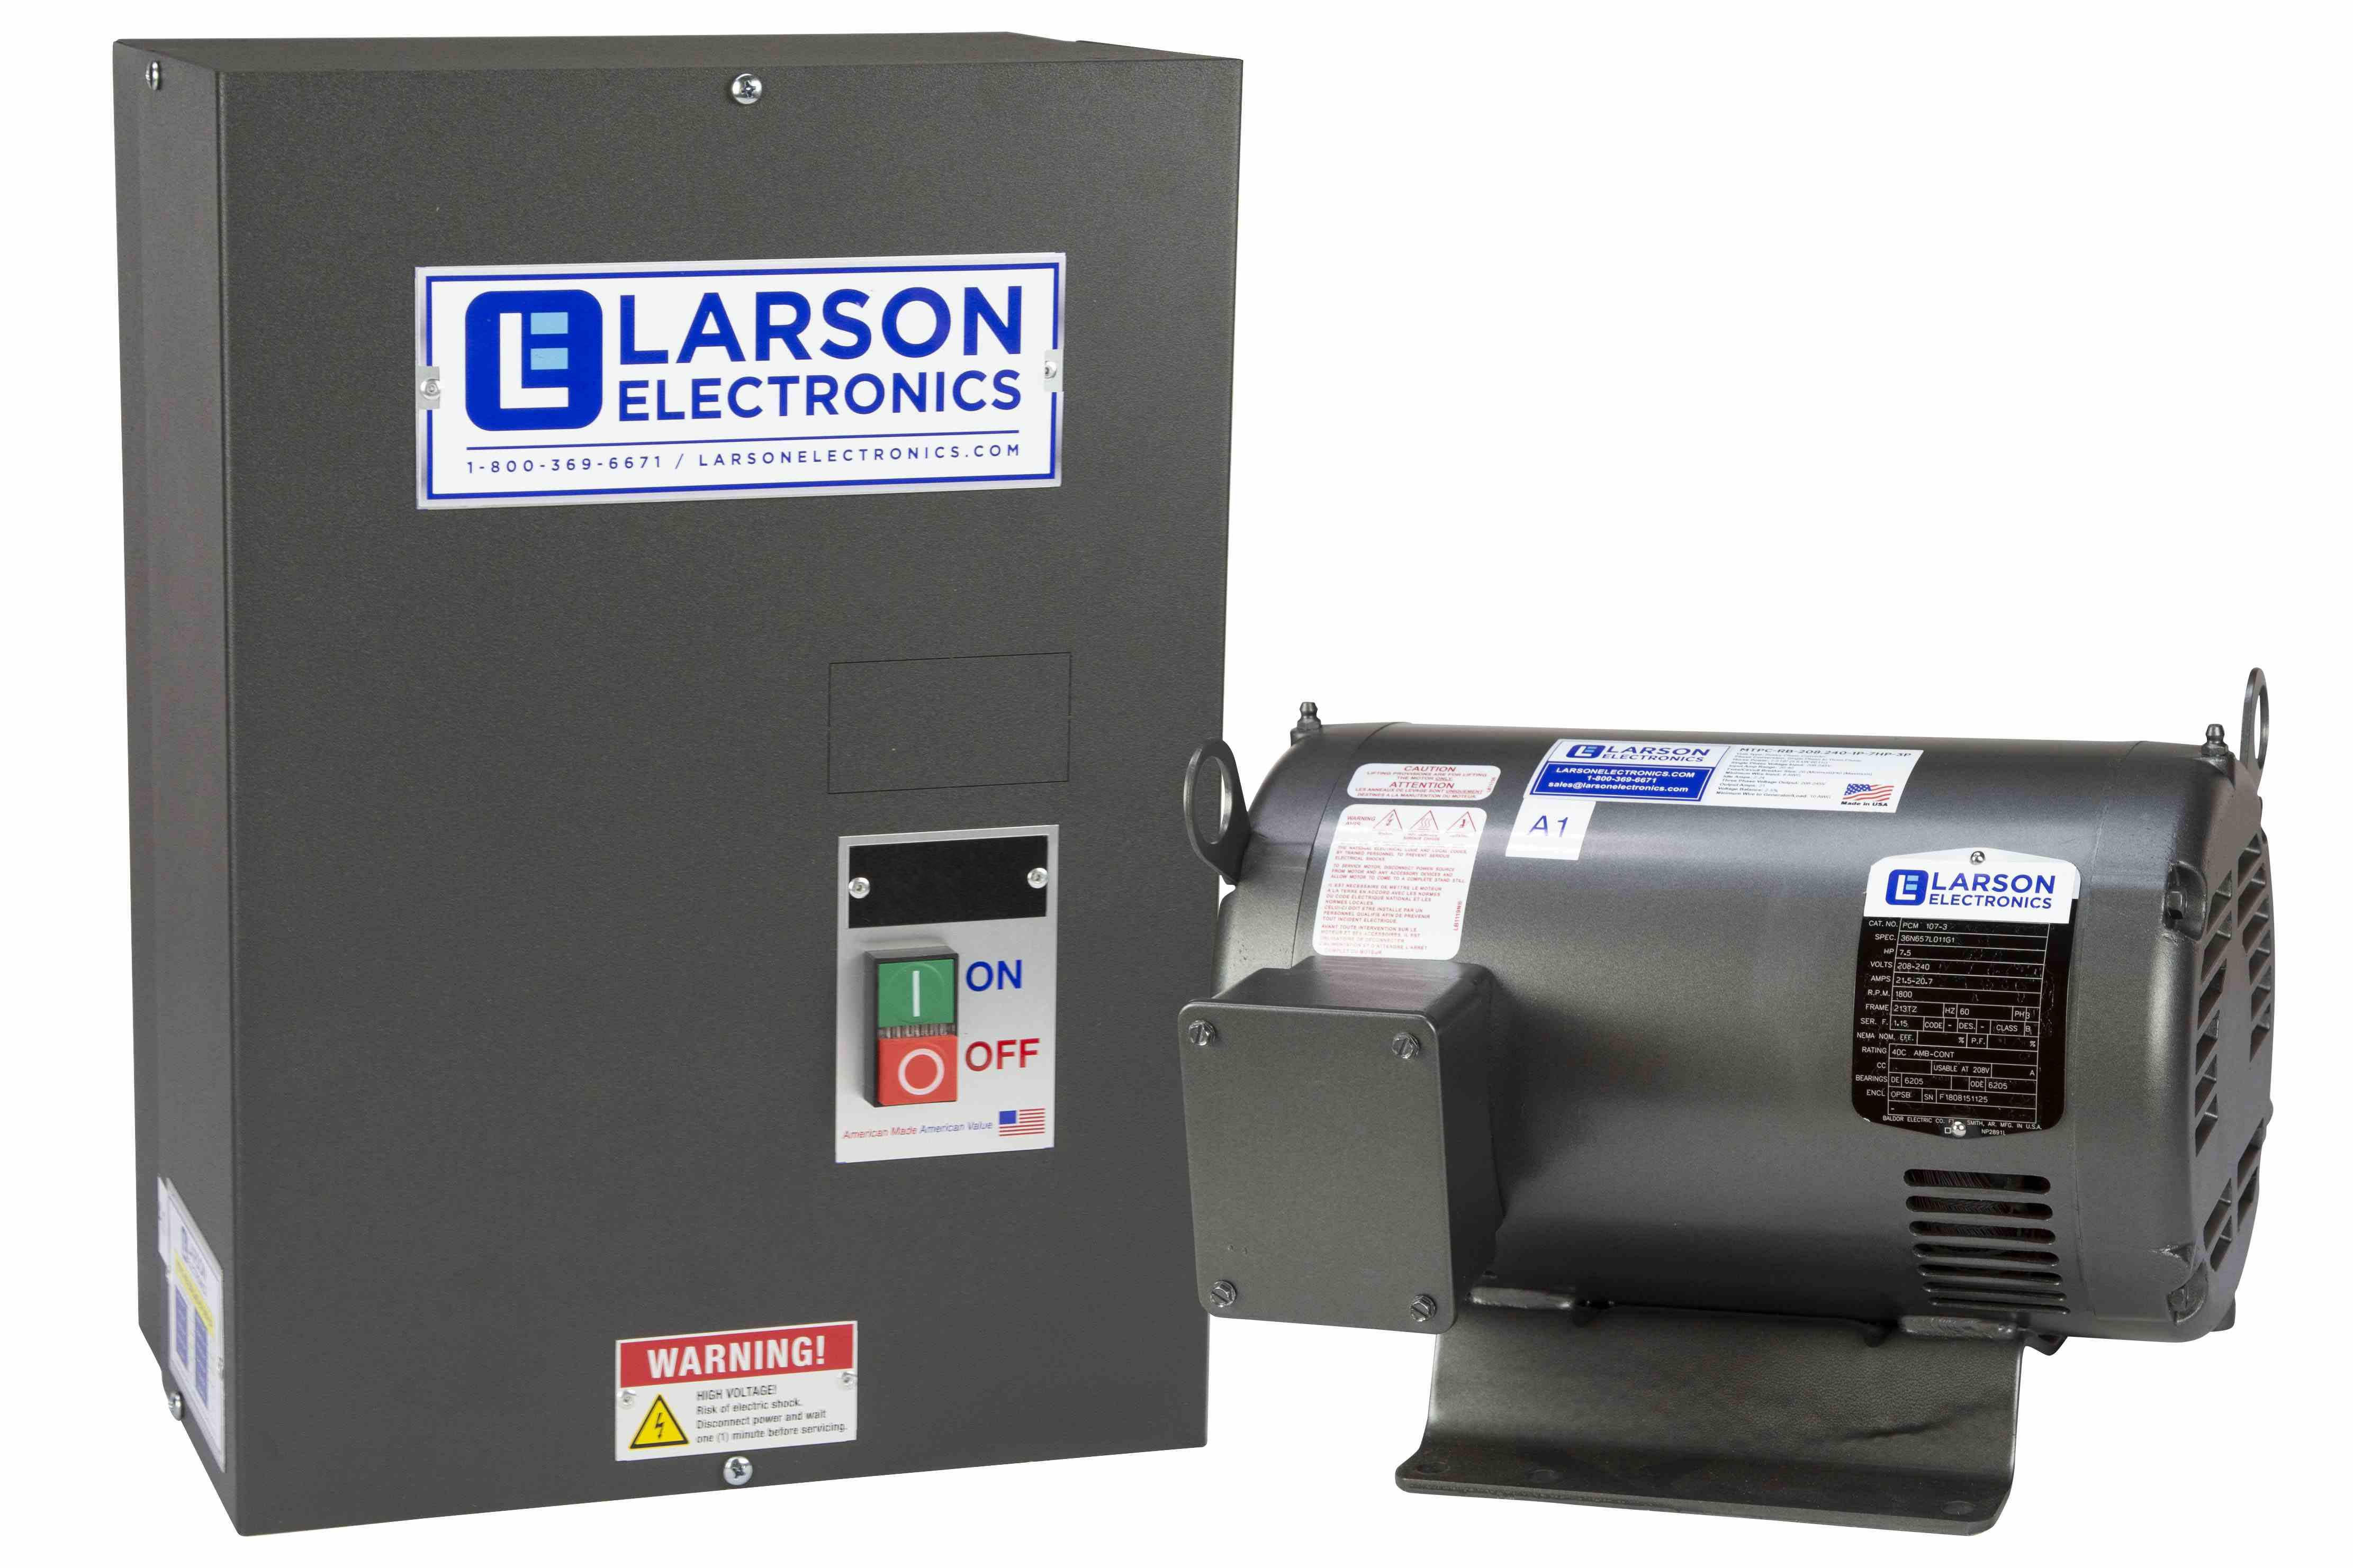 Rotary Phase Converter for 100HP Hard Loads, 440V 1PH to 3PH, 71.5 Amps Output, 200HP Idler, NEMA 1